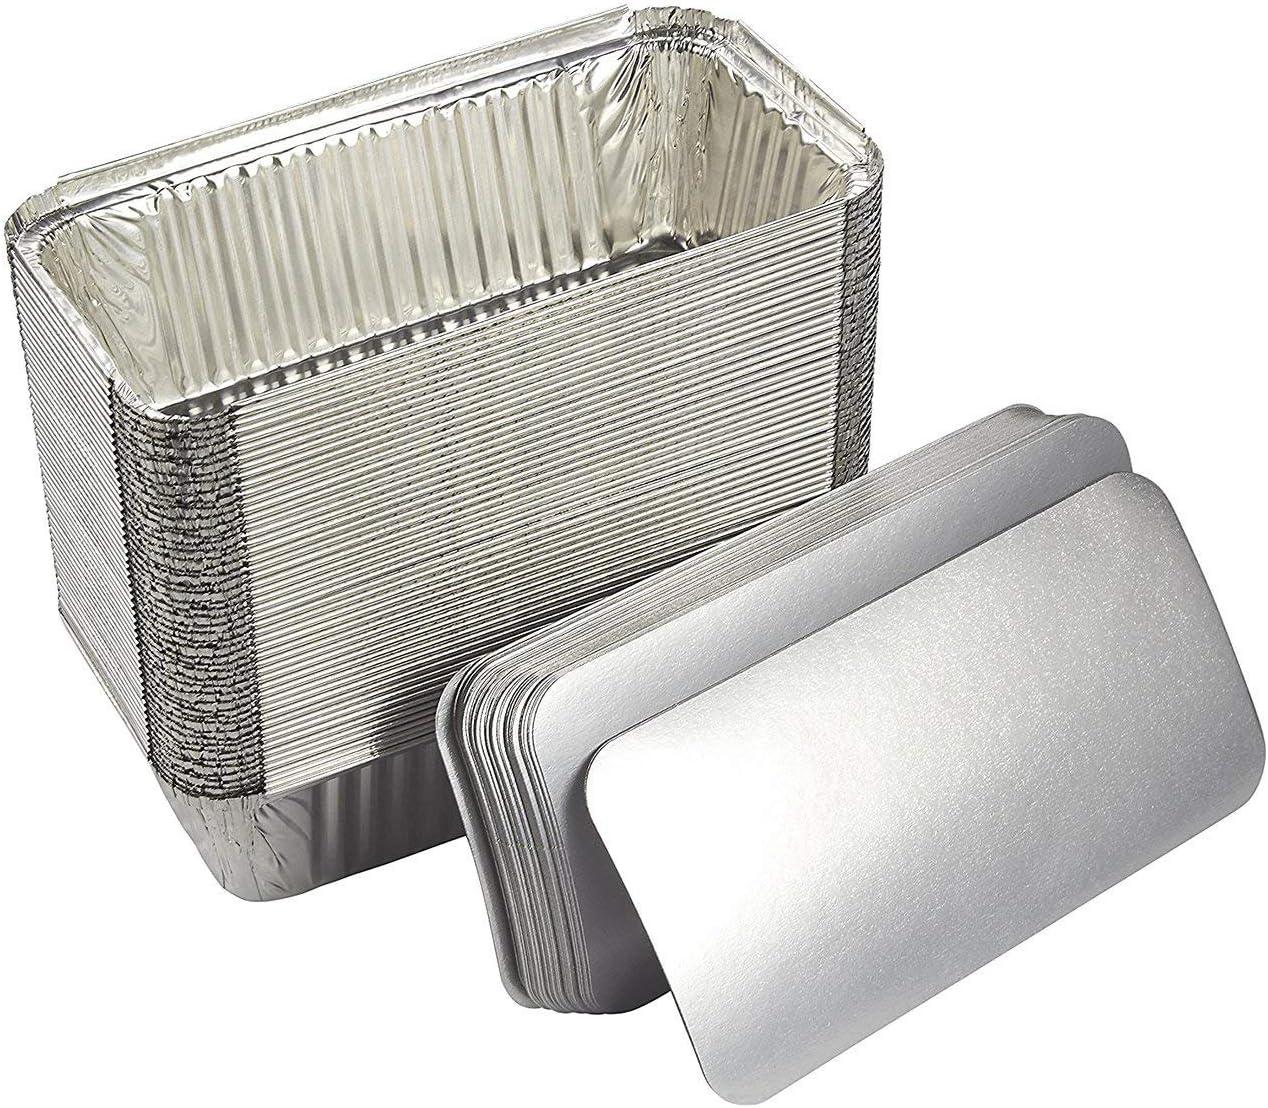 Zuvo 50 Large Aluminium Disposable Reusable Foil Food Container